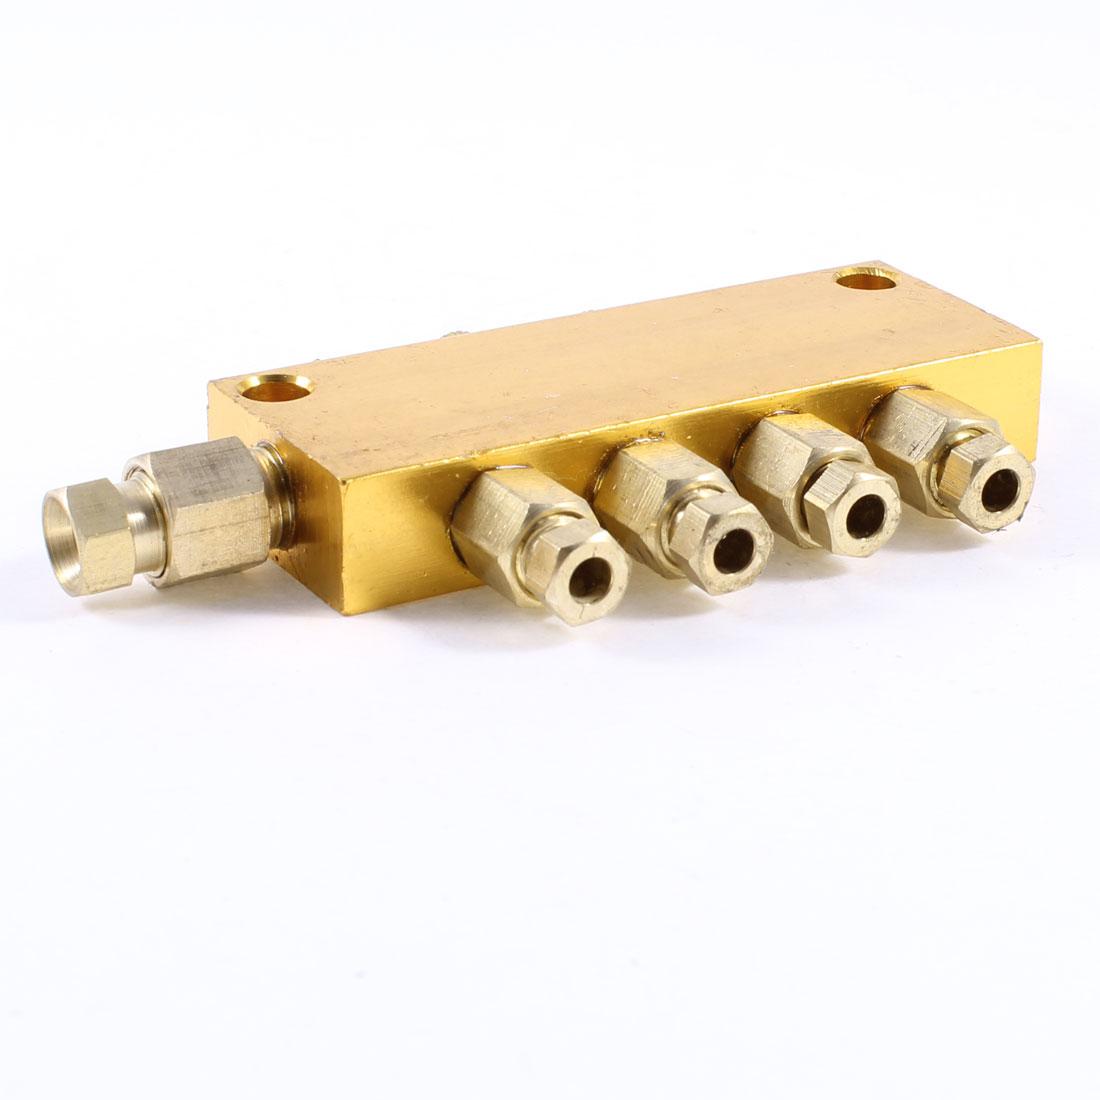 Air Pneumatic Brass Adjustable 4 Ways Oil Distributor Regulating Manifold